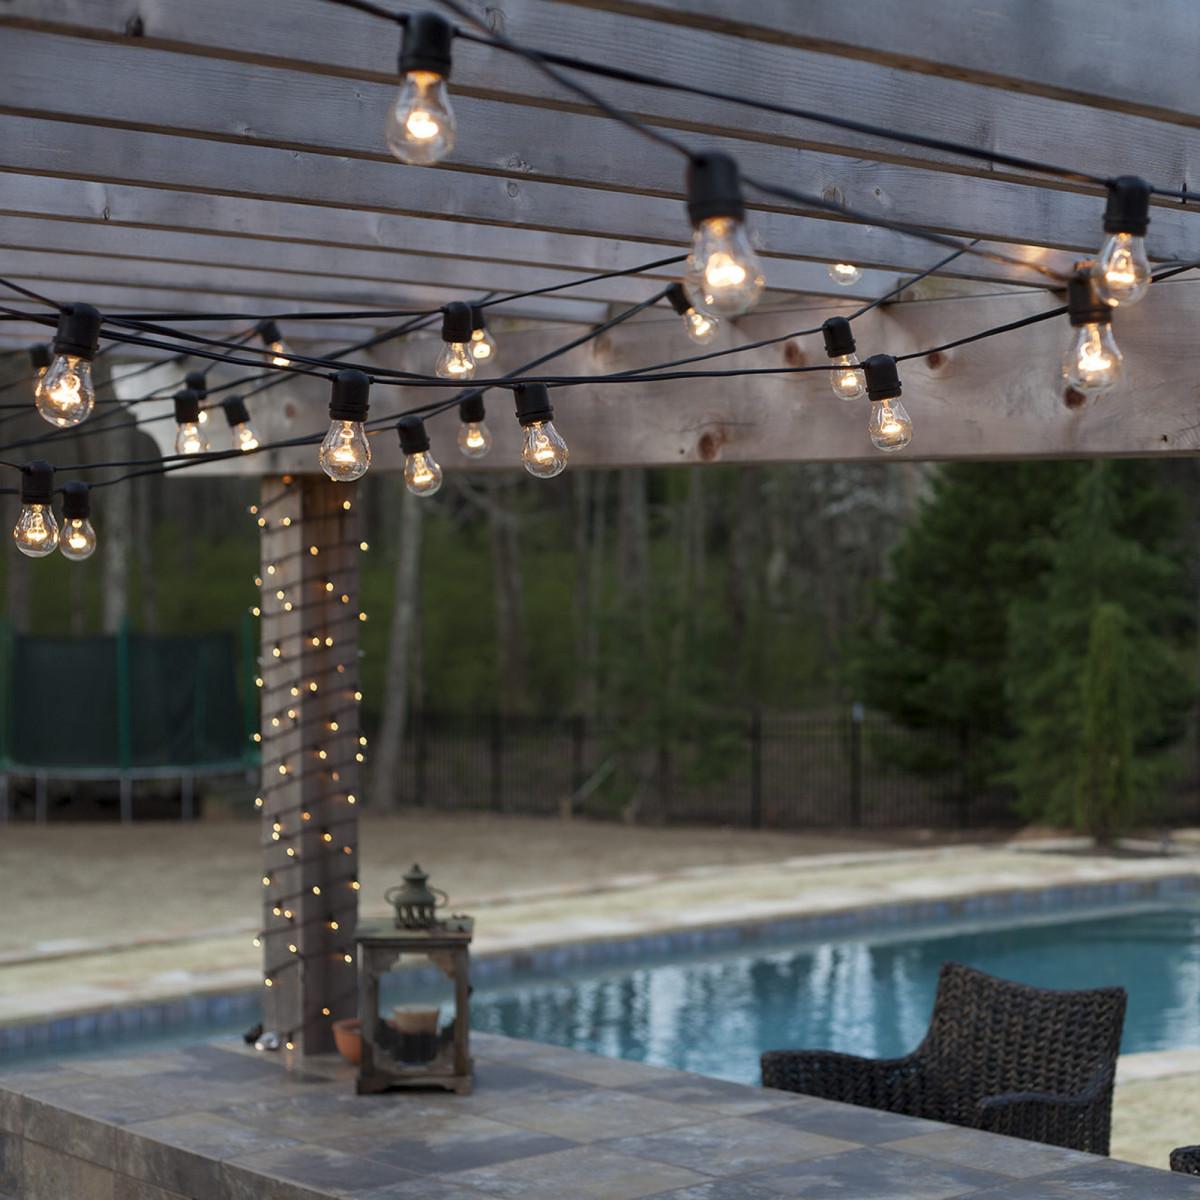 Feestverlichting LED Patio 30 helder - 30 meter / 36 fittingen